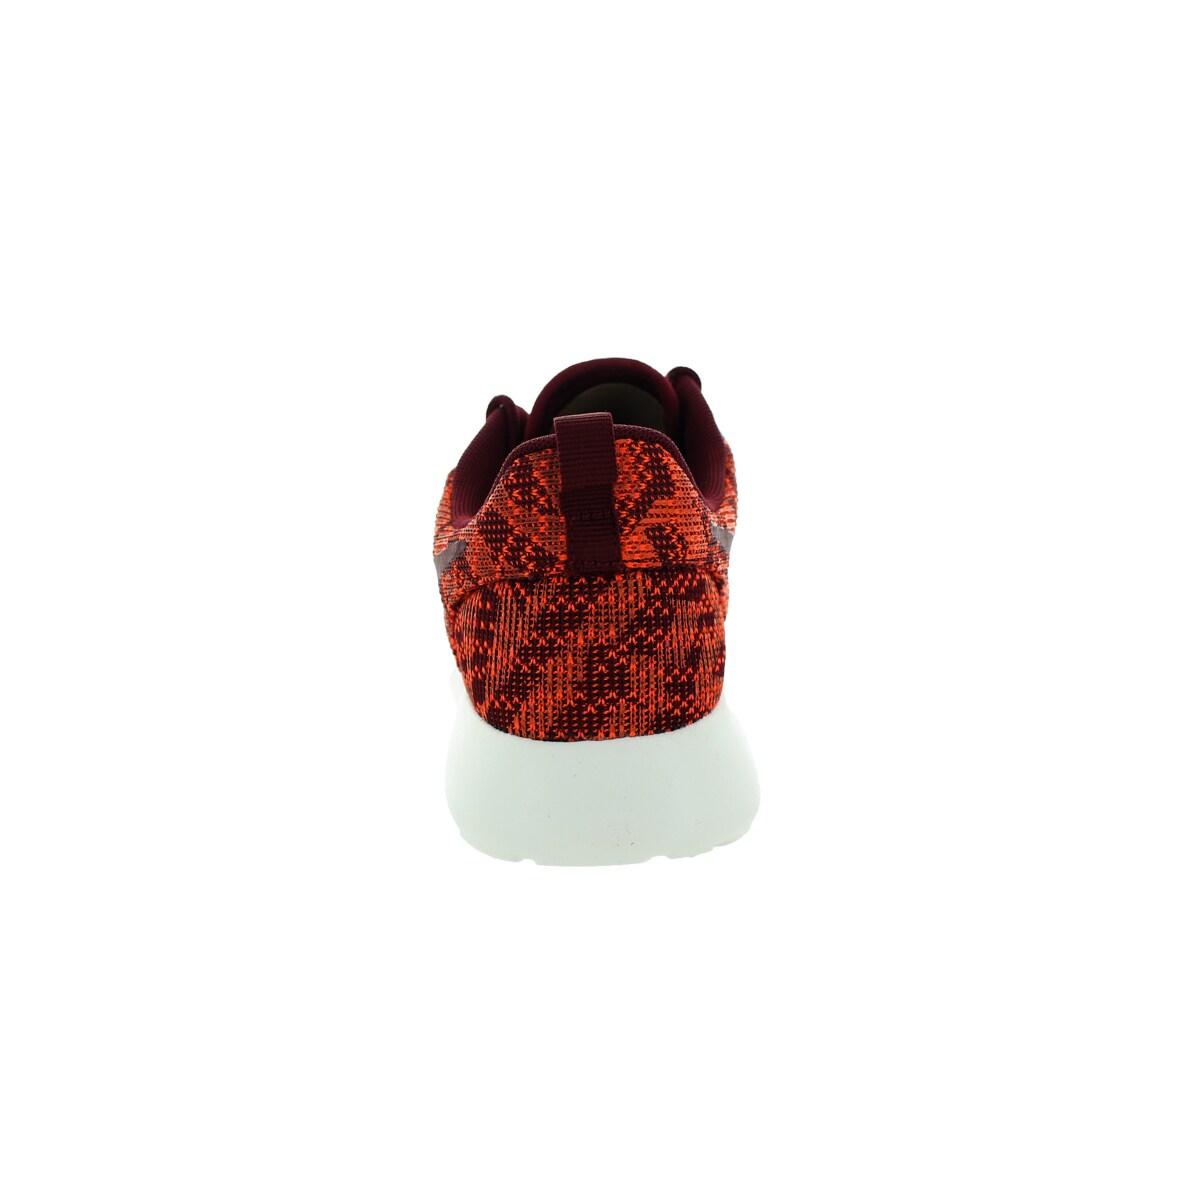 54130722f3ae Shop Nike Women s Roshe One Kjcrd Total Orange Team Red Sail Running Shoe -  Free Shipping Today - Overstock - 12321787